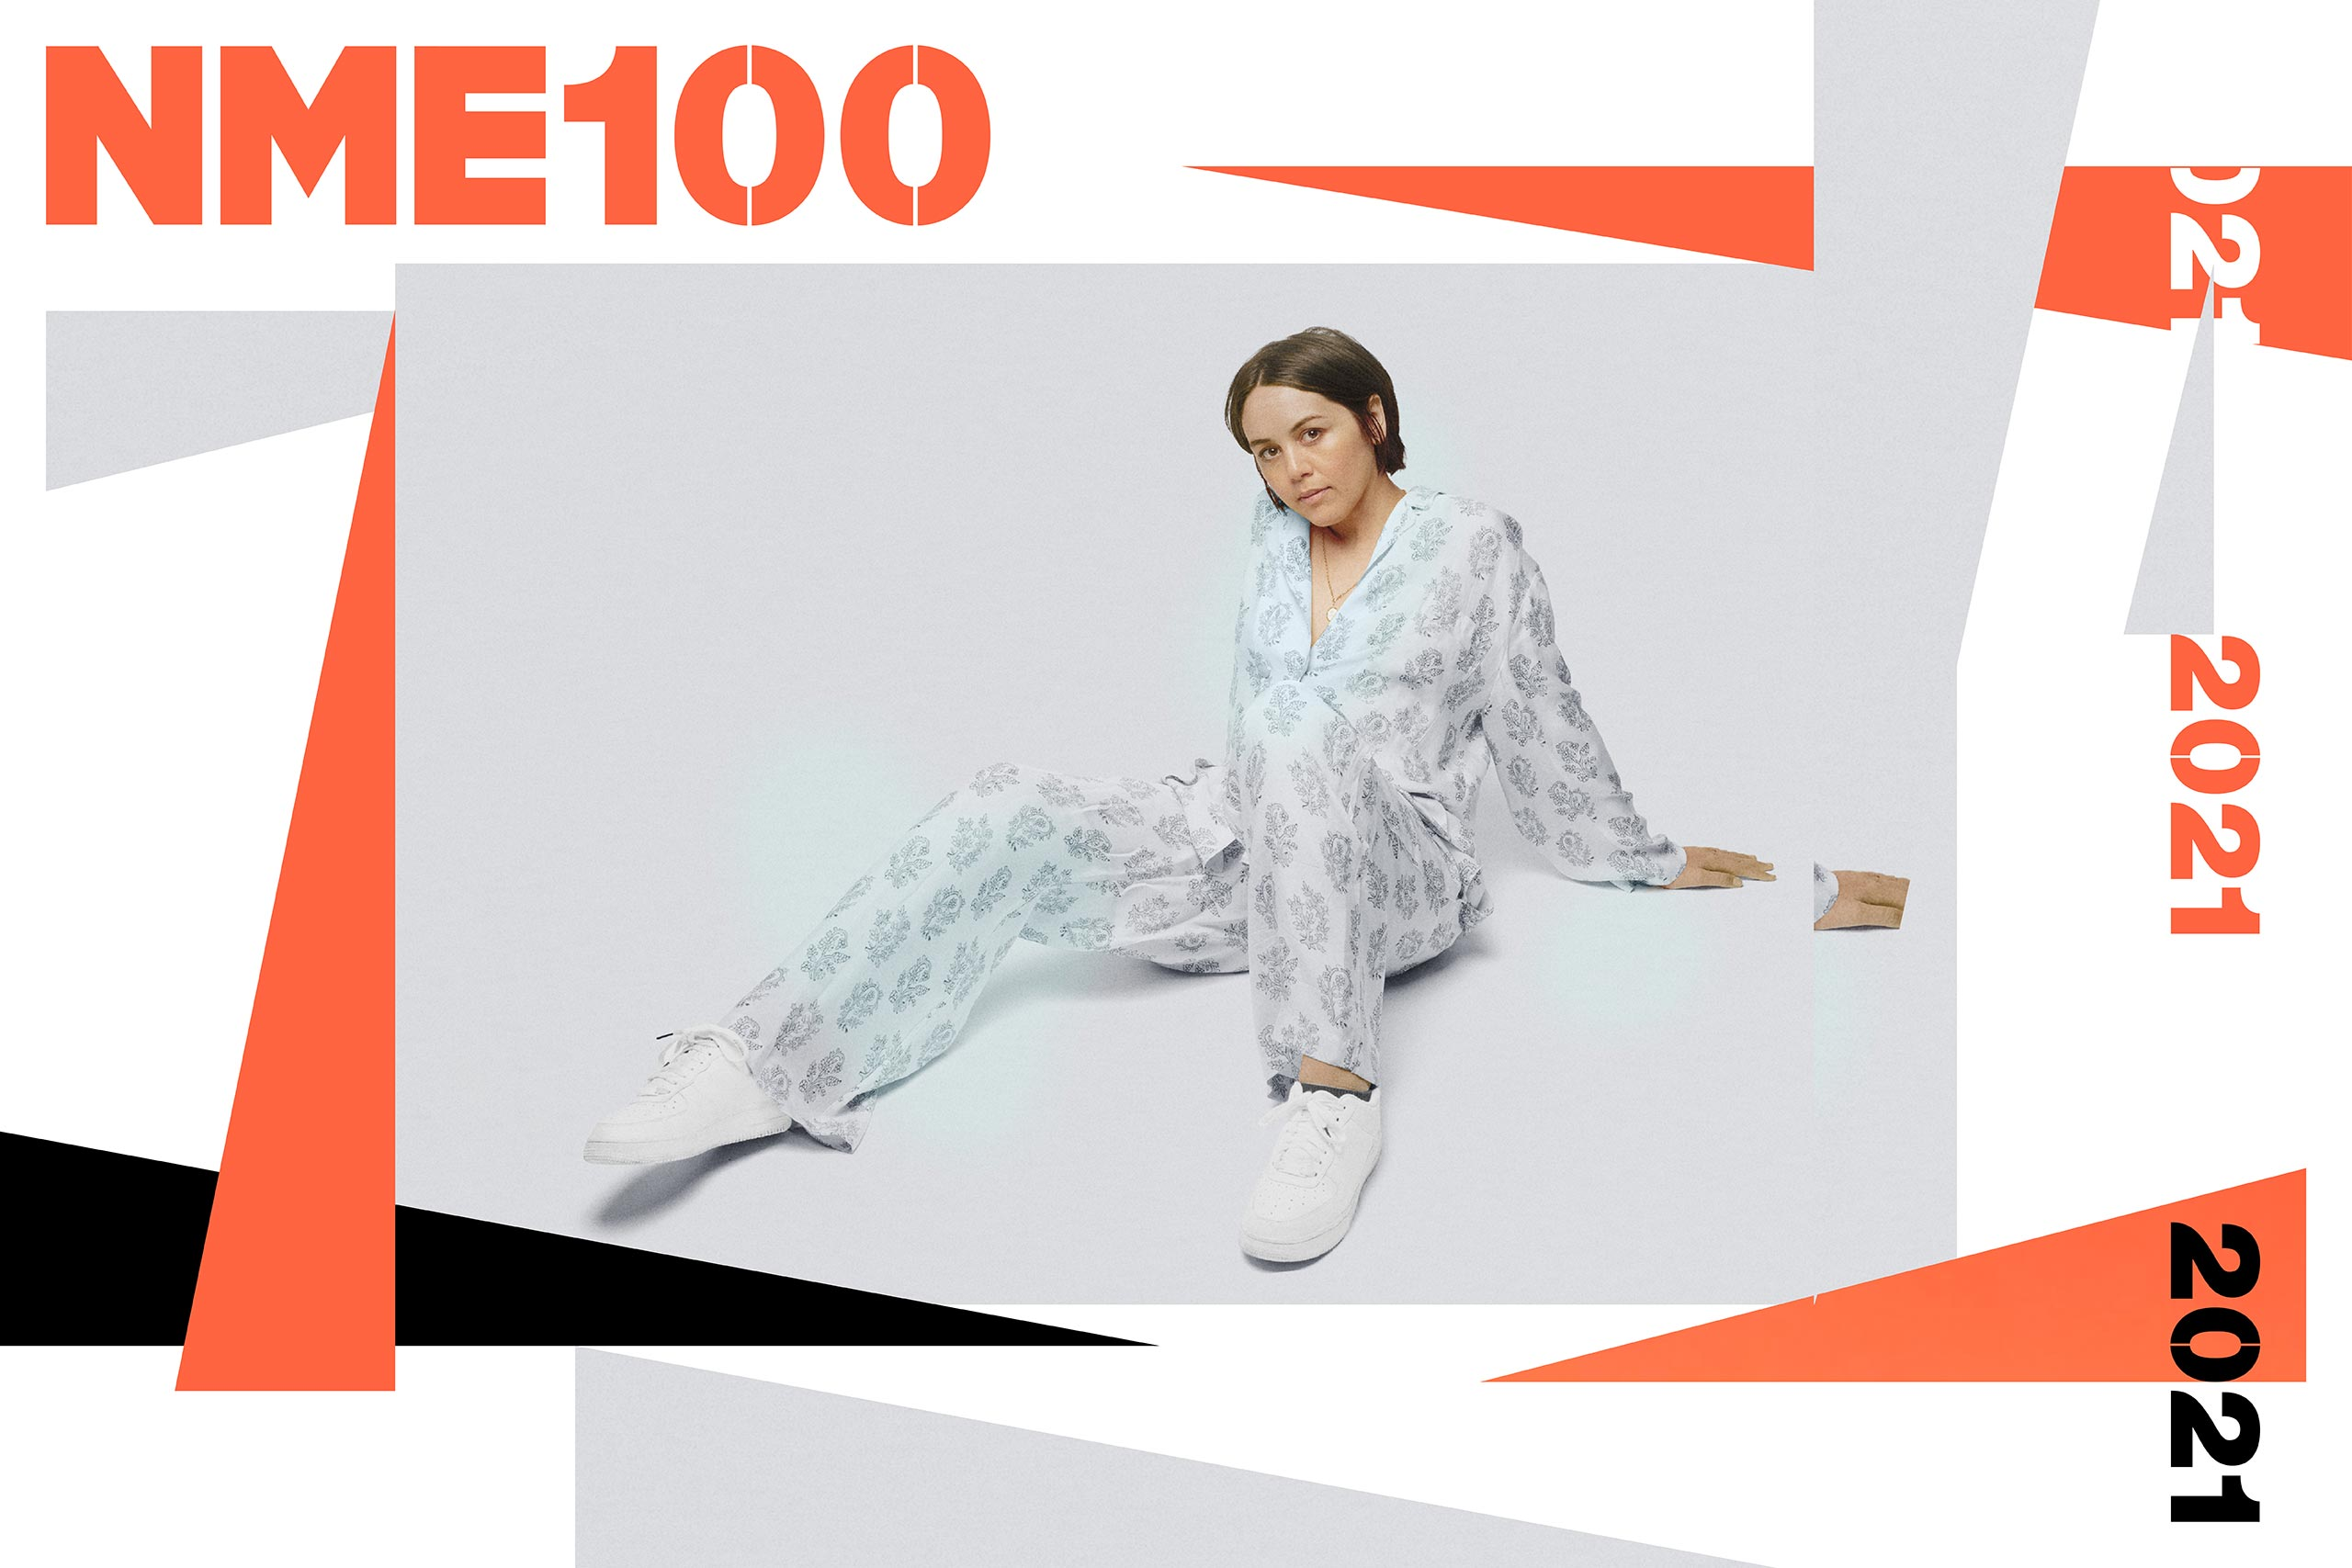 NME 100 logic 1000